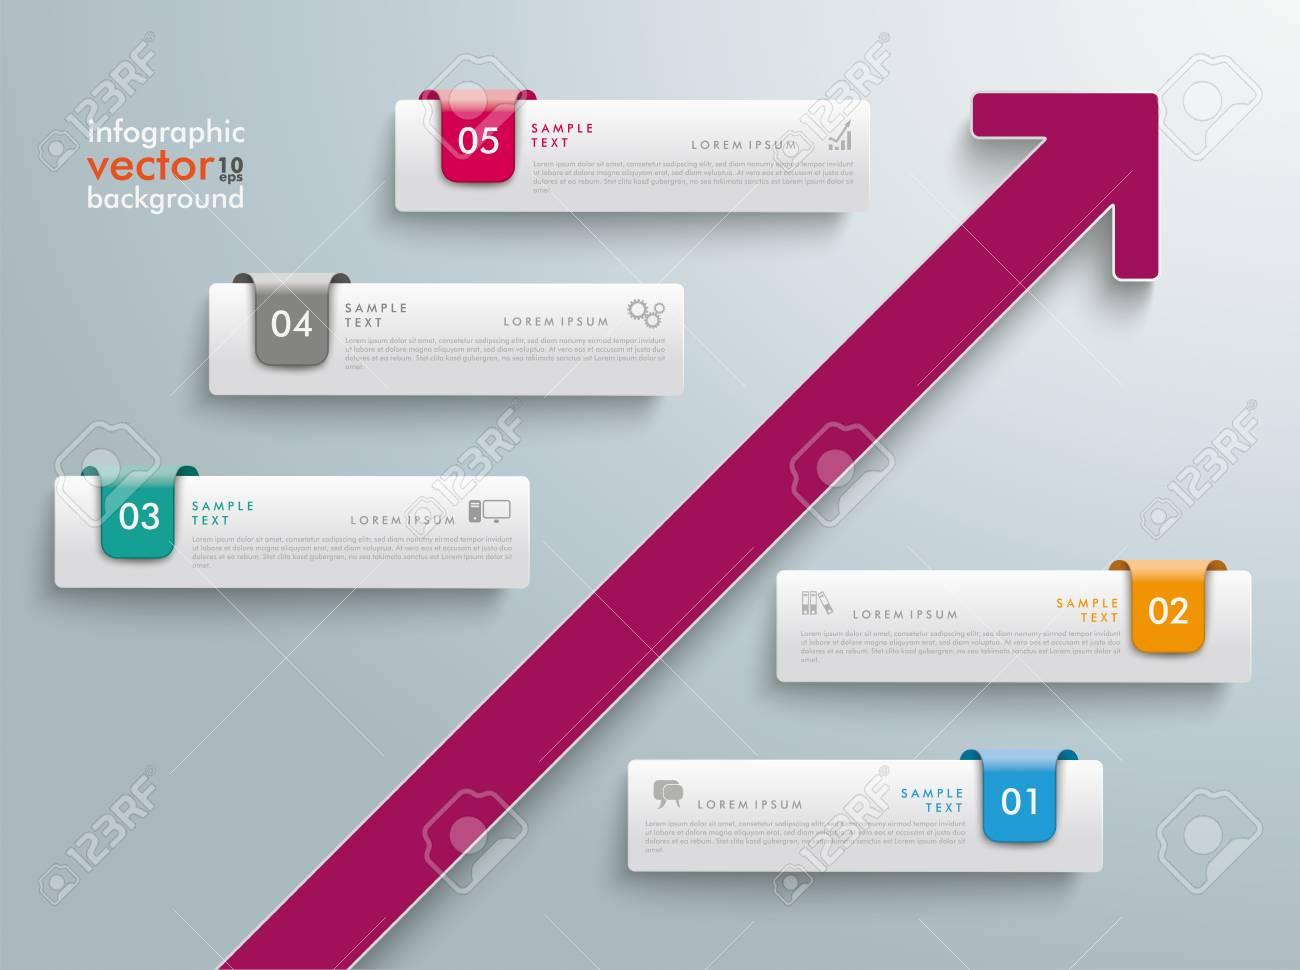 Diseño Infográfico Con 5 Pestañas Y Flecha Morada Sobre Fondo Gris ...